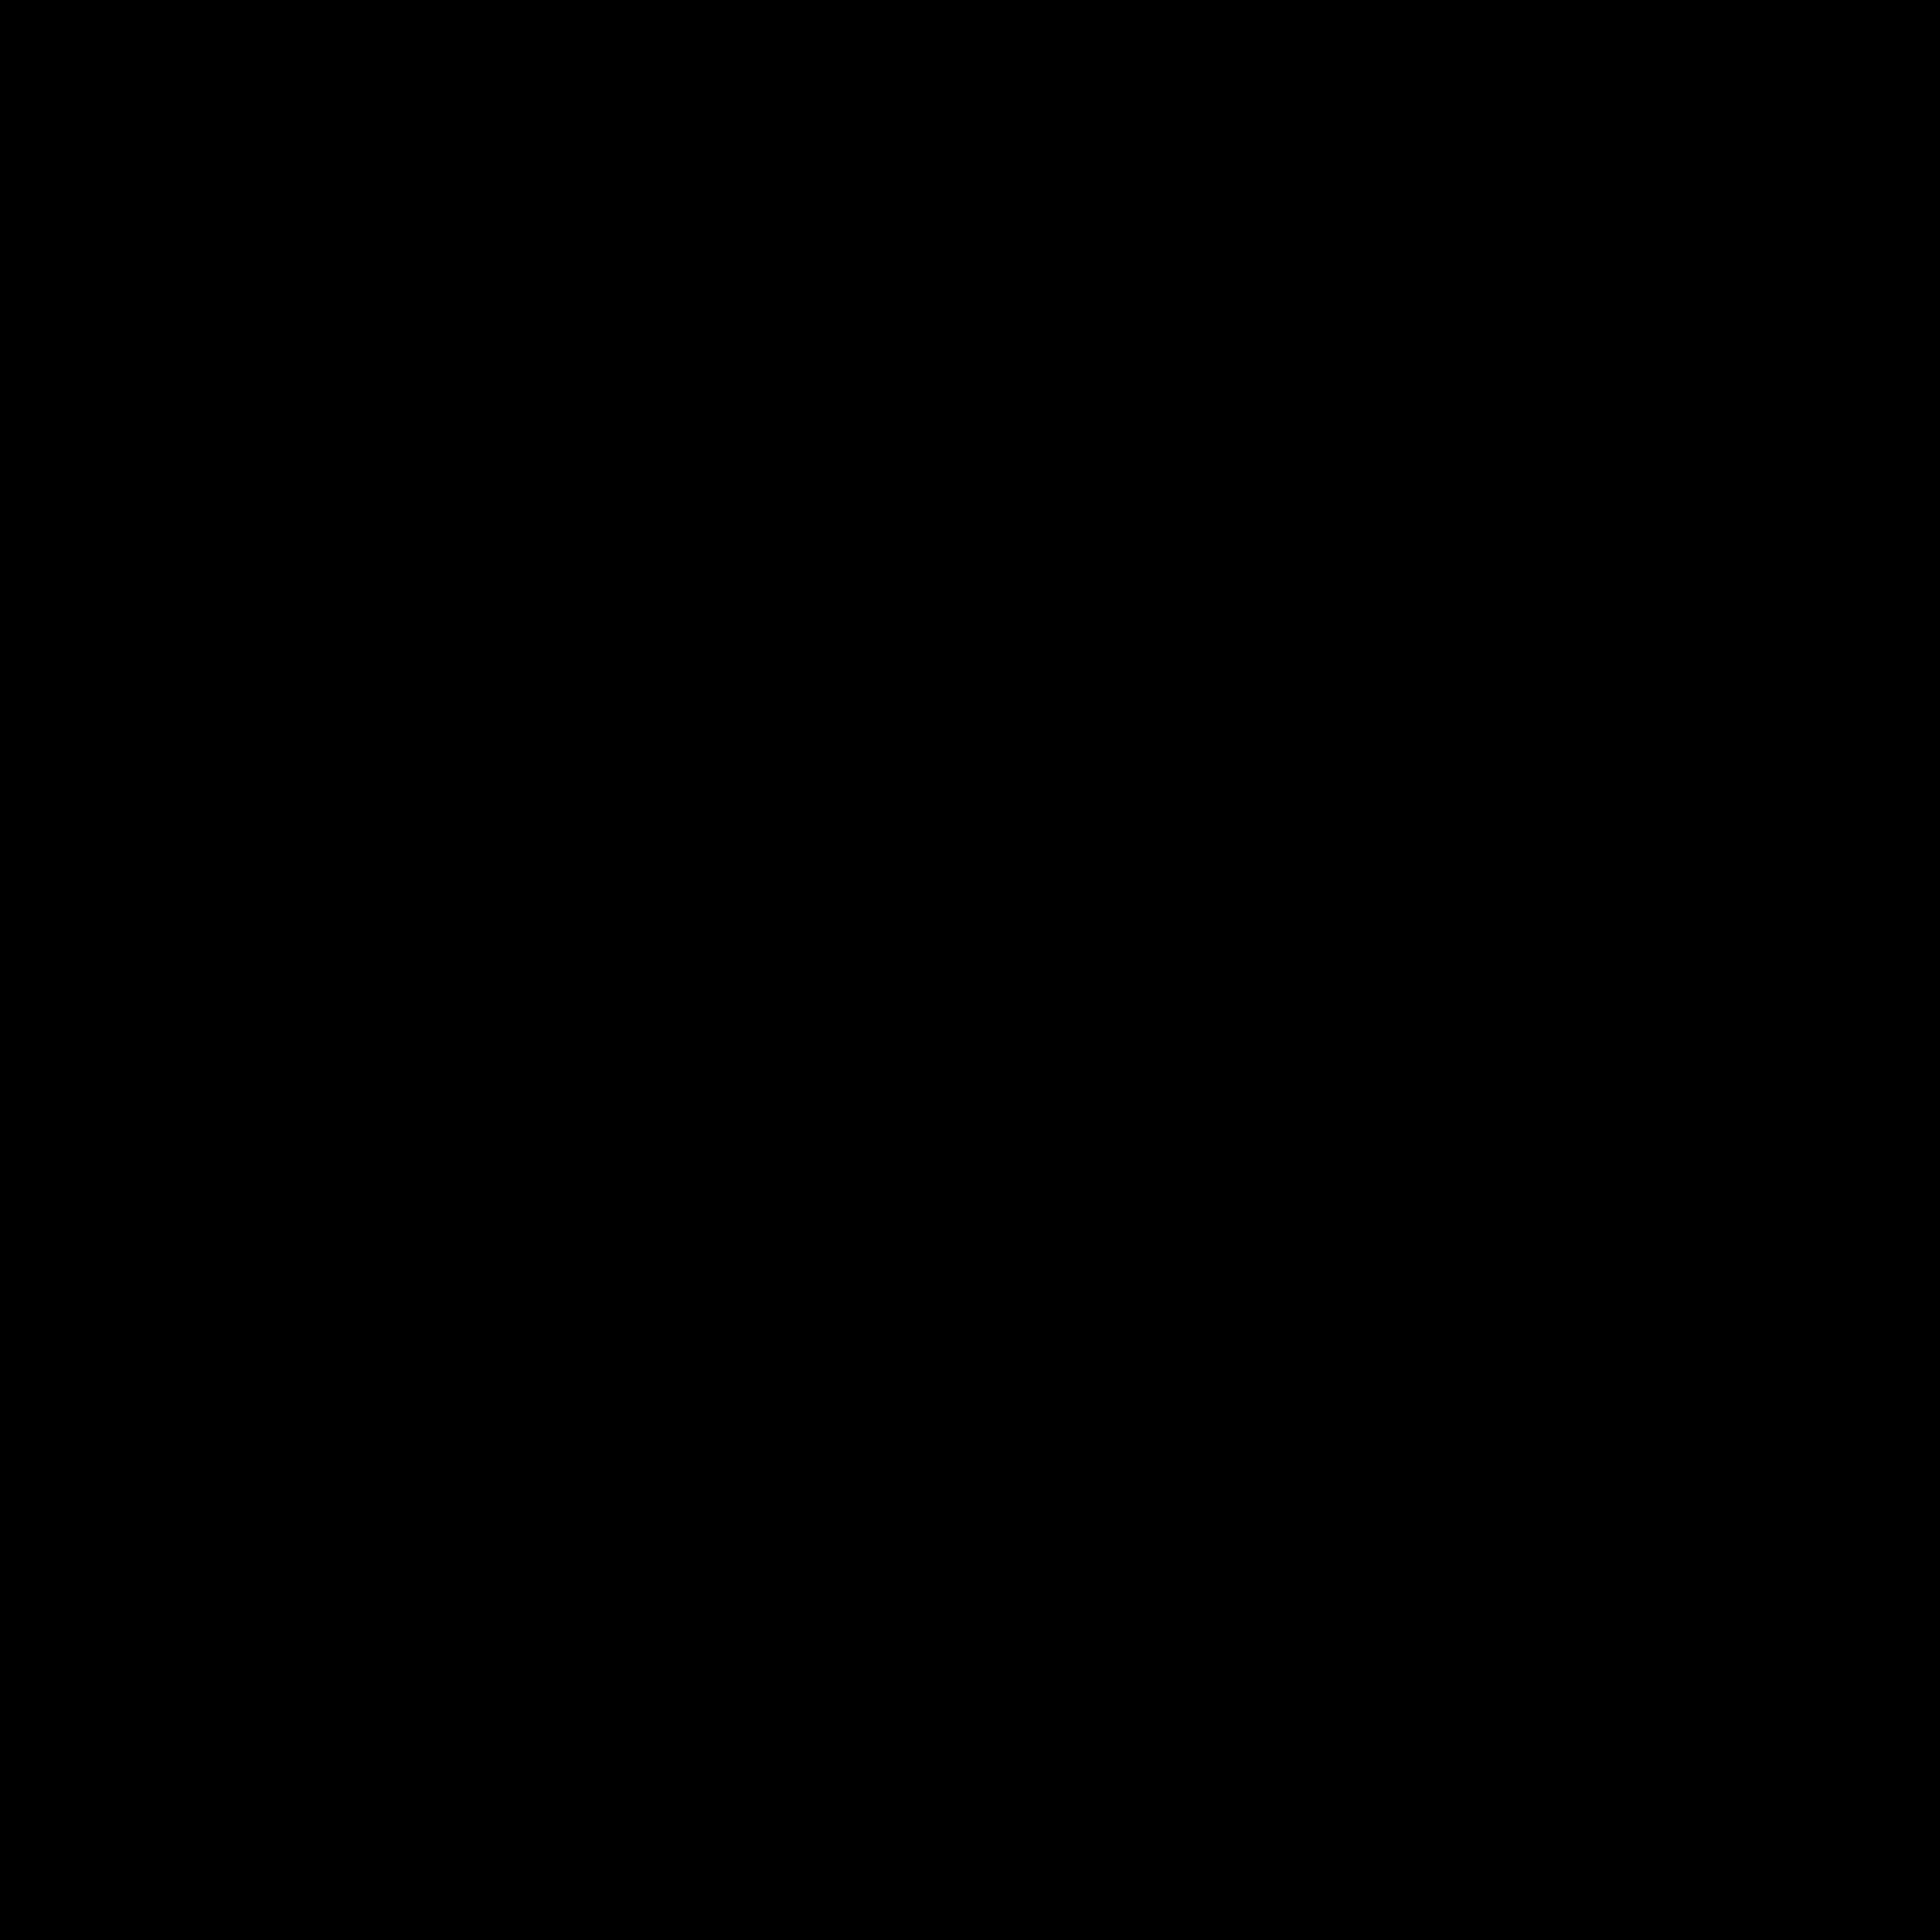 govuk icon